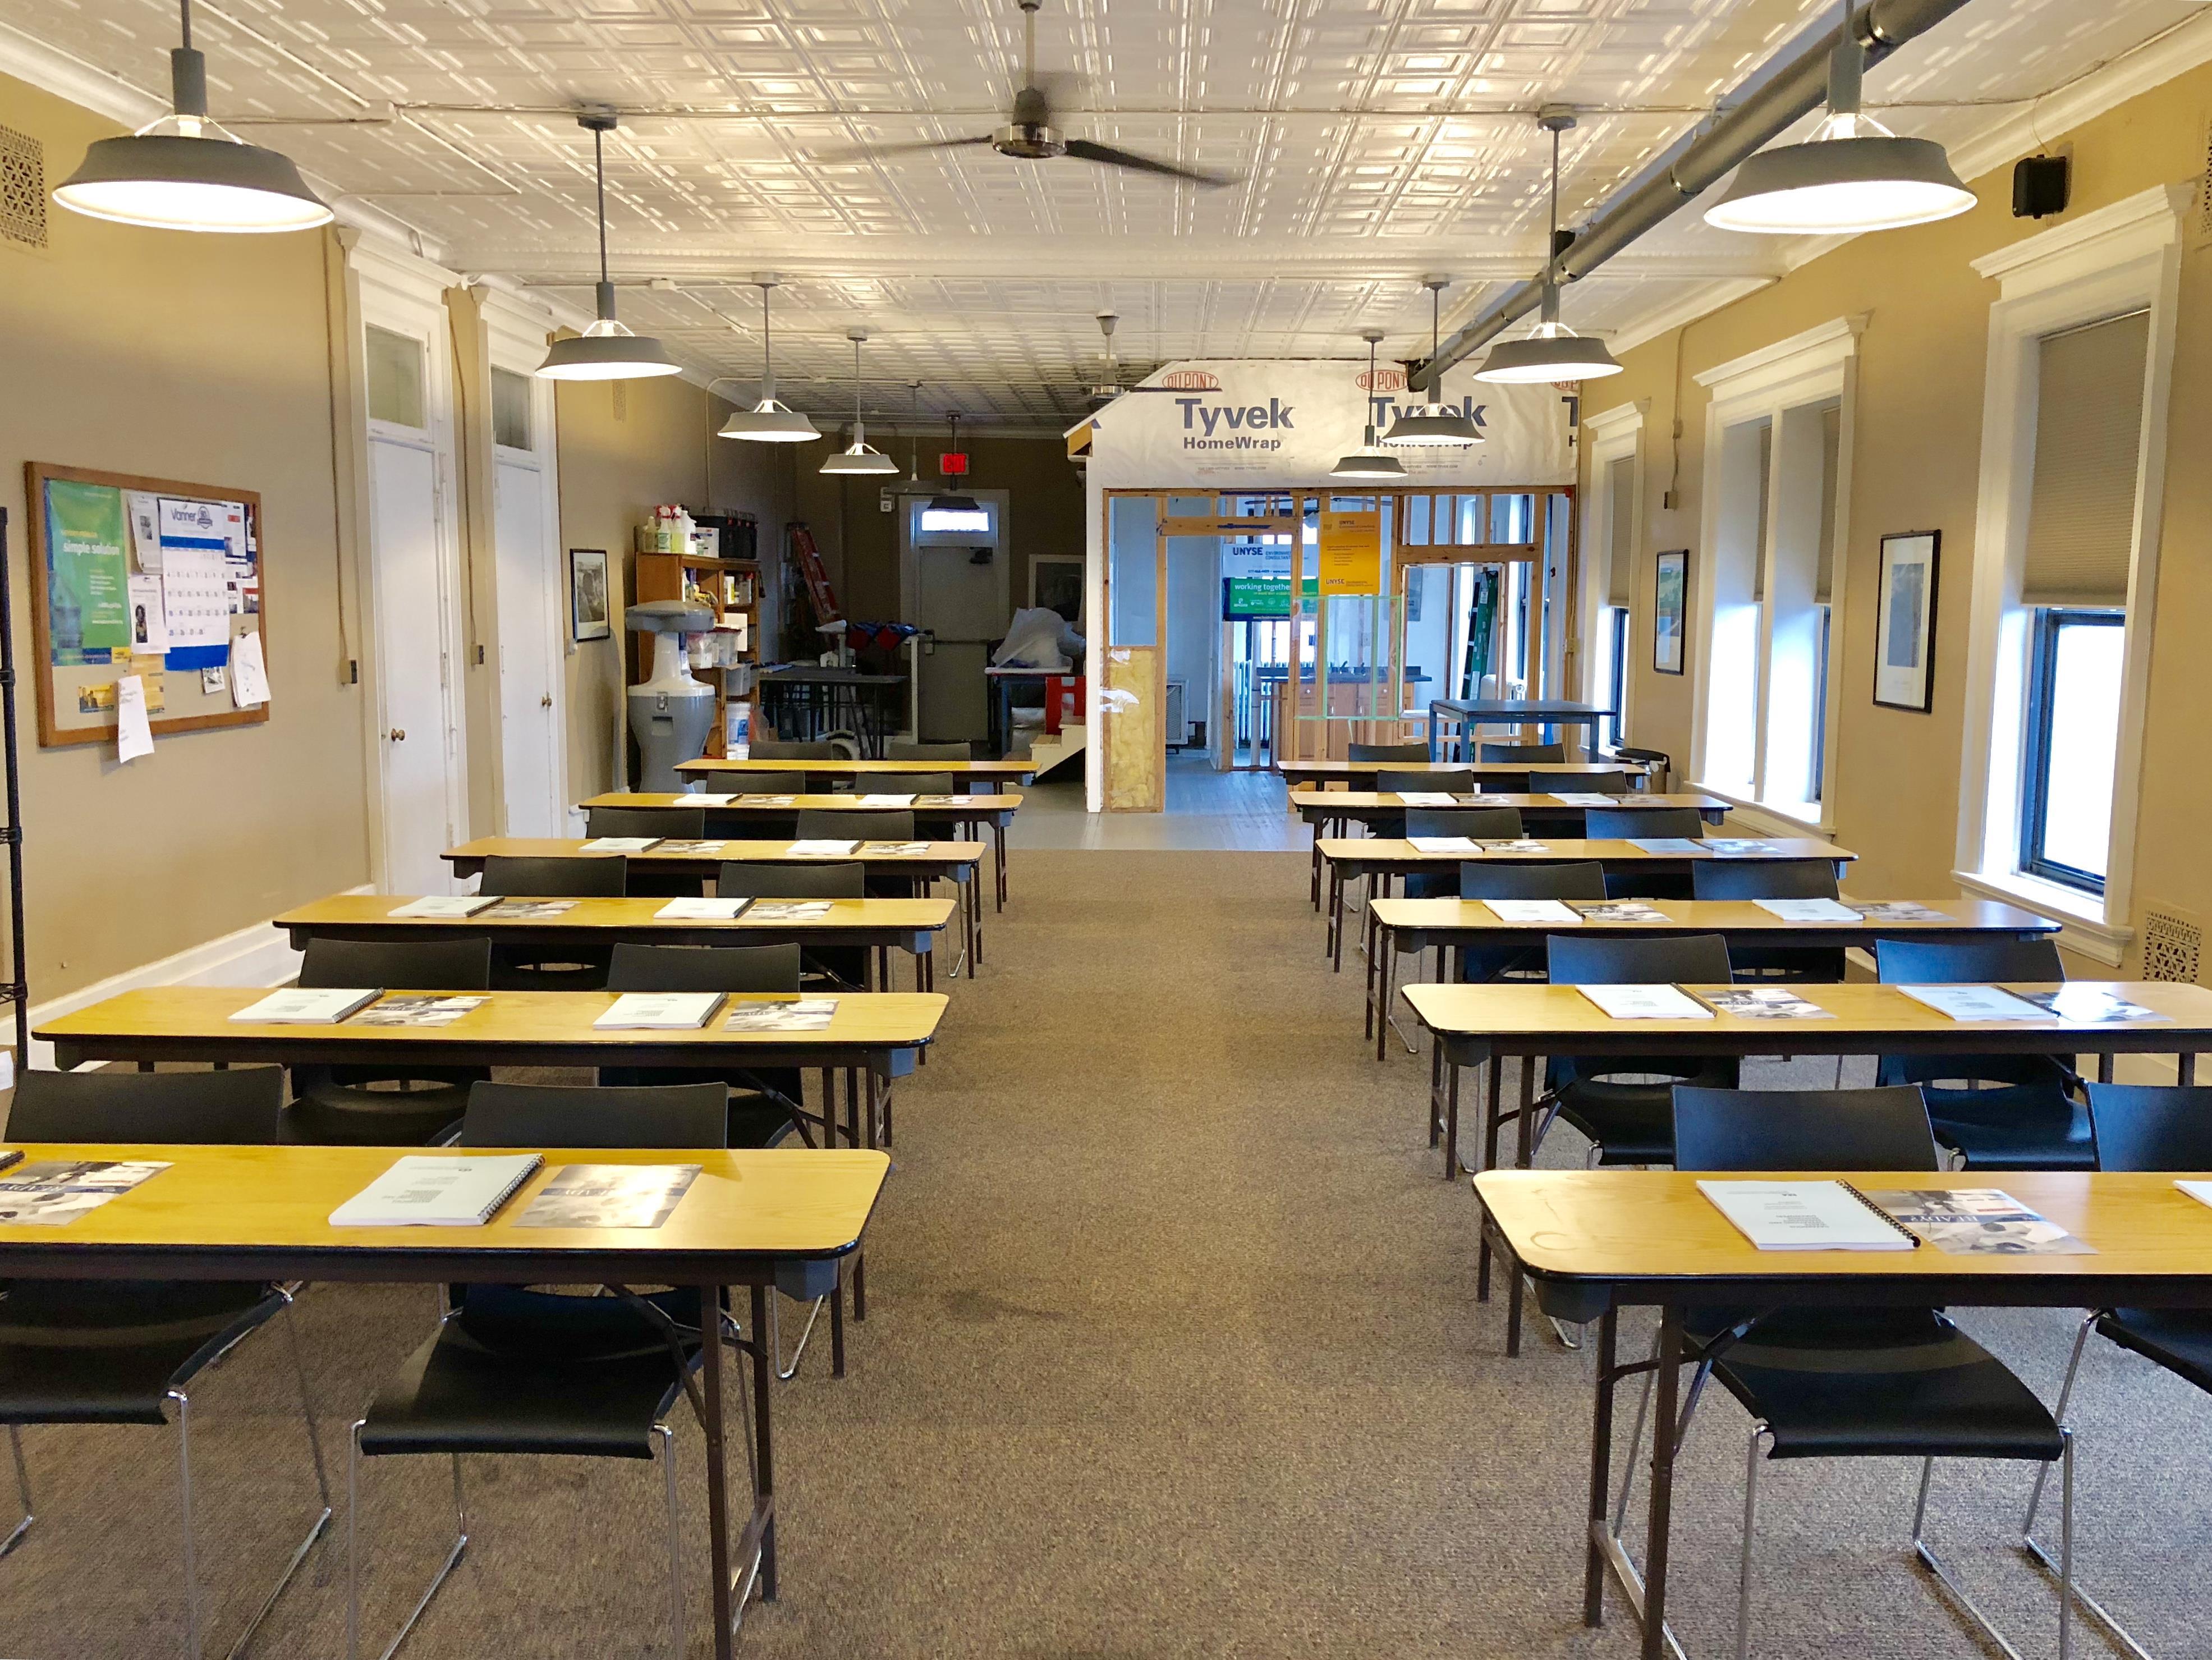 Old Precinct 13 - Upstairs Classroom